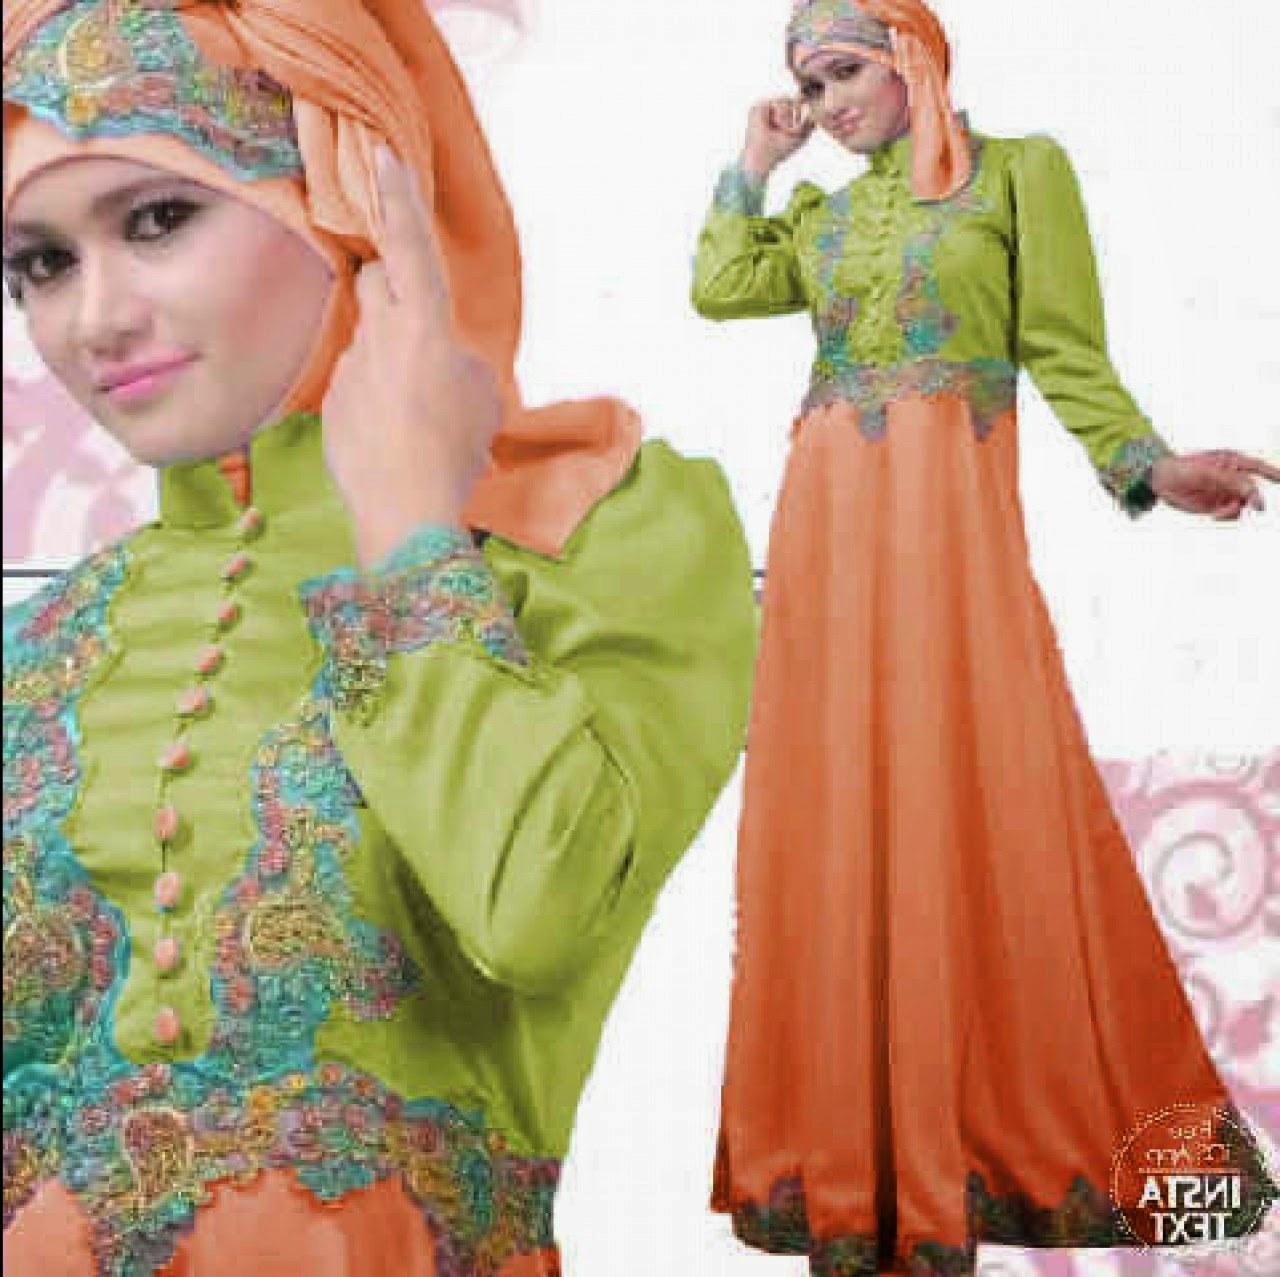 Bentuk Baju Lebaran Trend 2018 Whdr Kumpulan Foto Model Baju Kebaya Lebaran Terbaru 2018